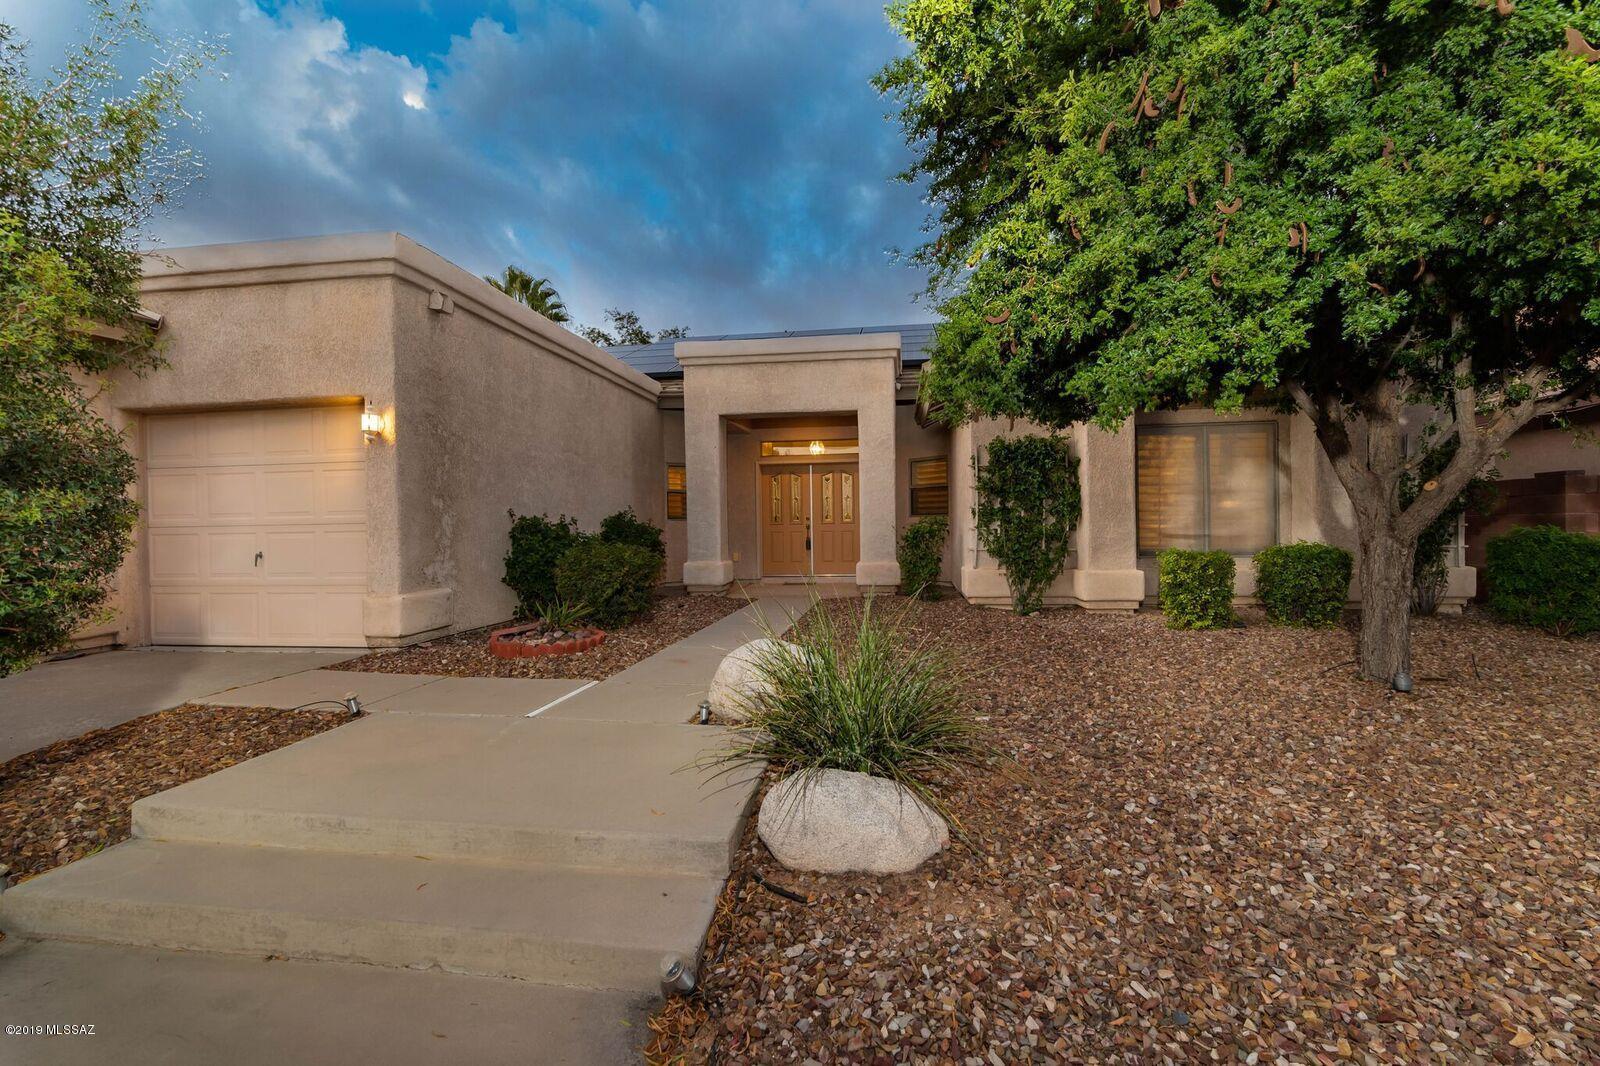 Photo of 1890 Hawk Ridge Street, Tucson, AZ 85737